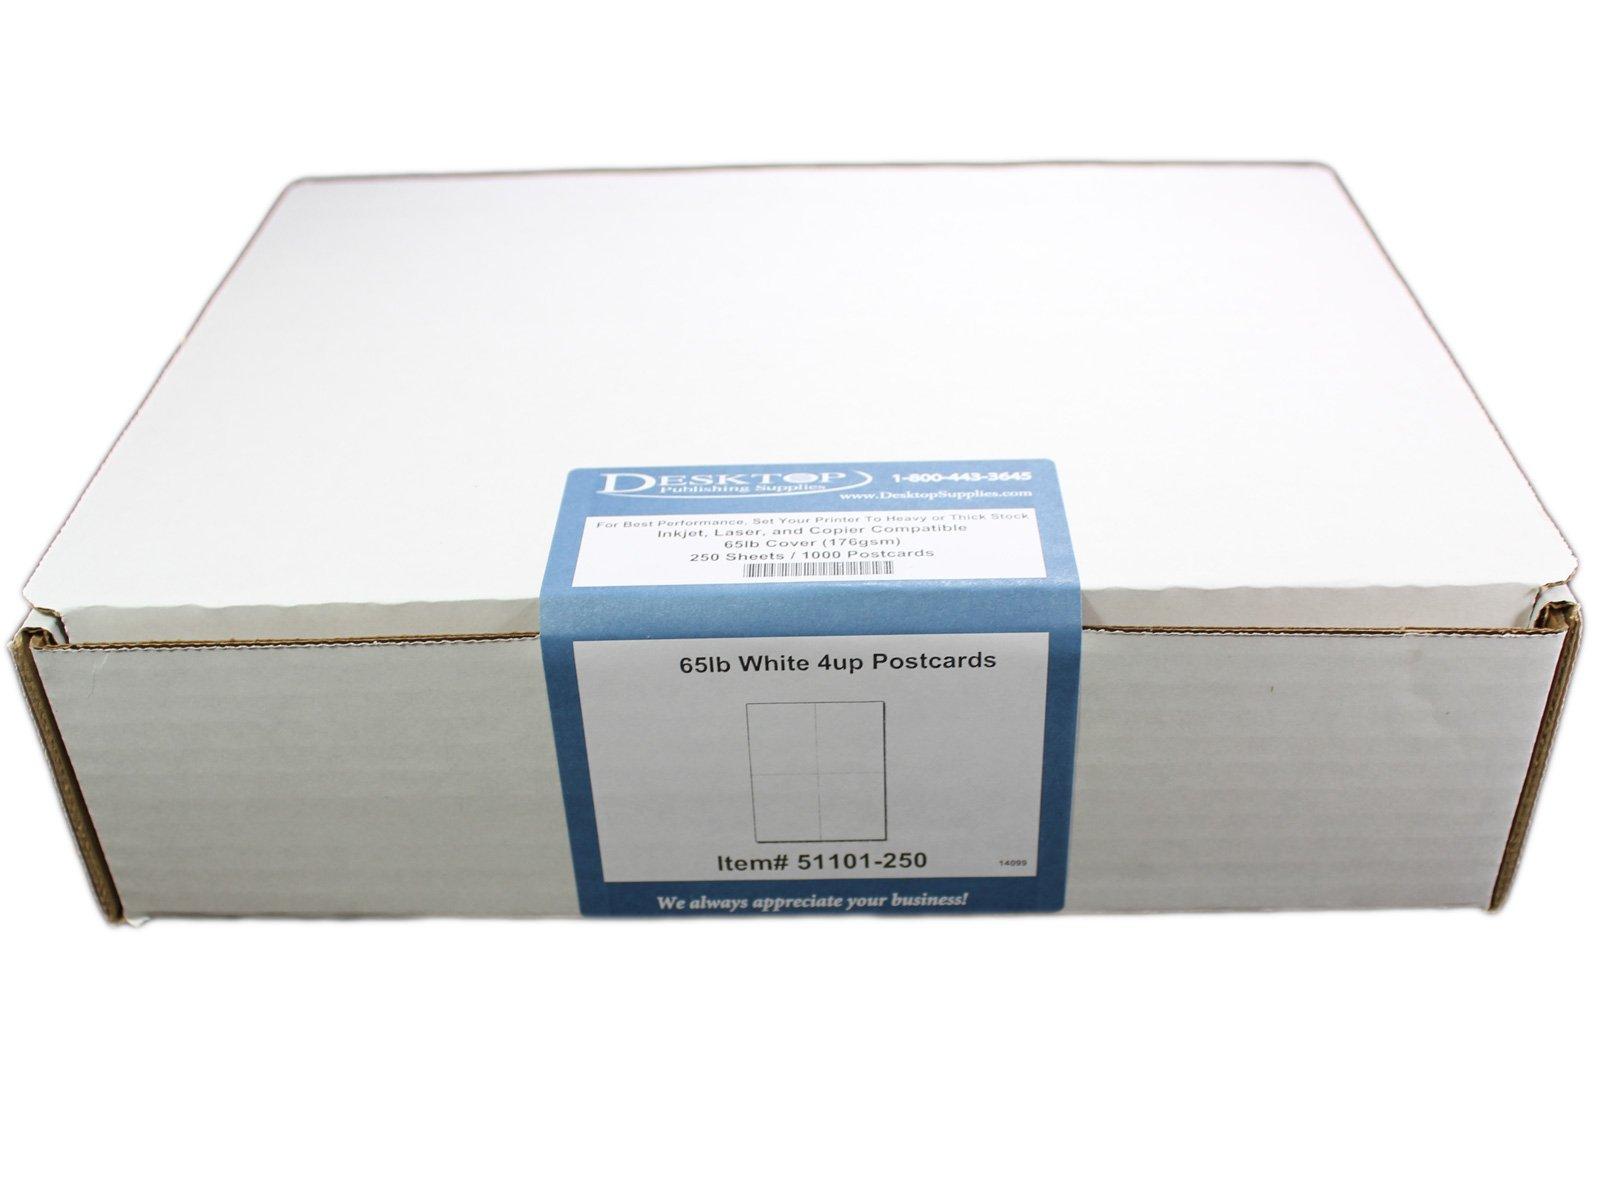 65lb White 4up Postcards - 250 Sheets/1000 Postcards - Desktop Publishing Supplies, Inc.TM Brand